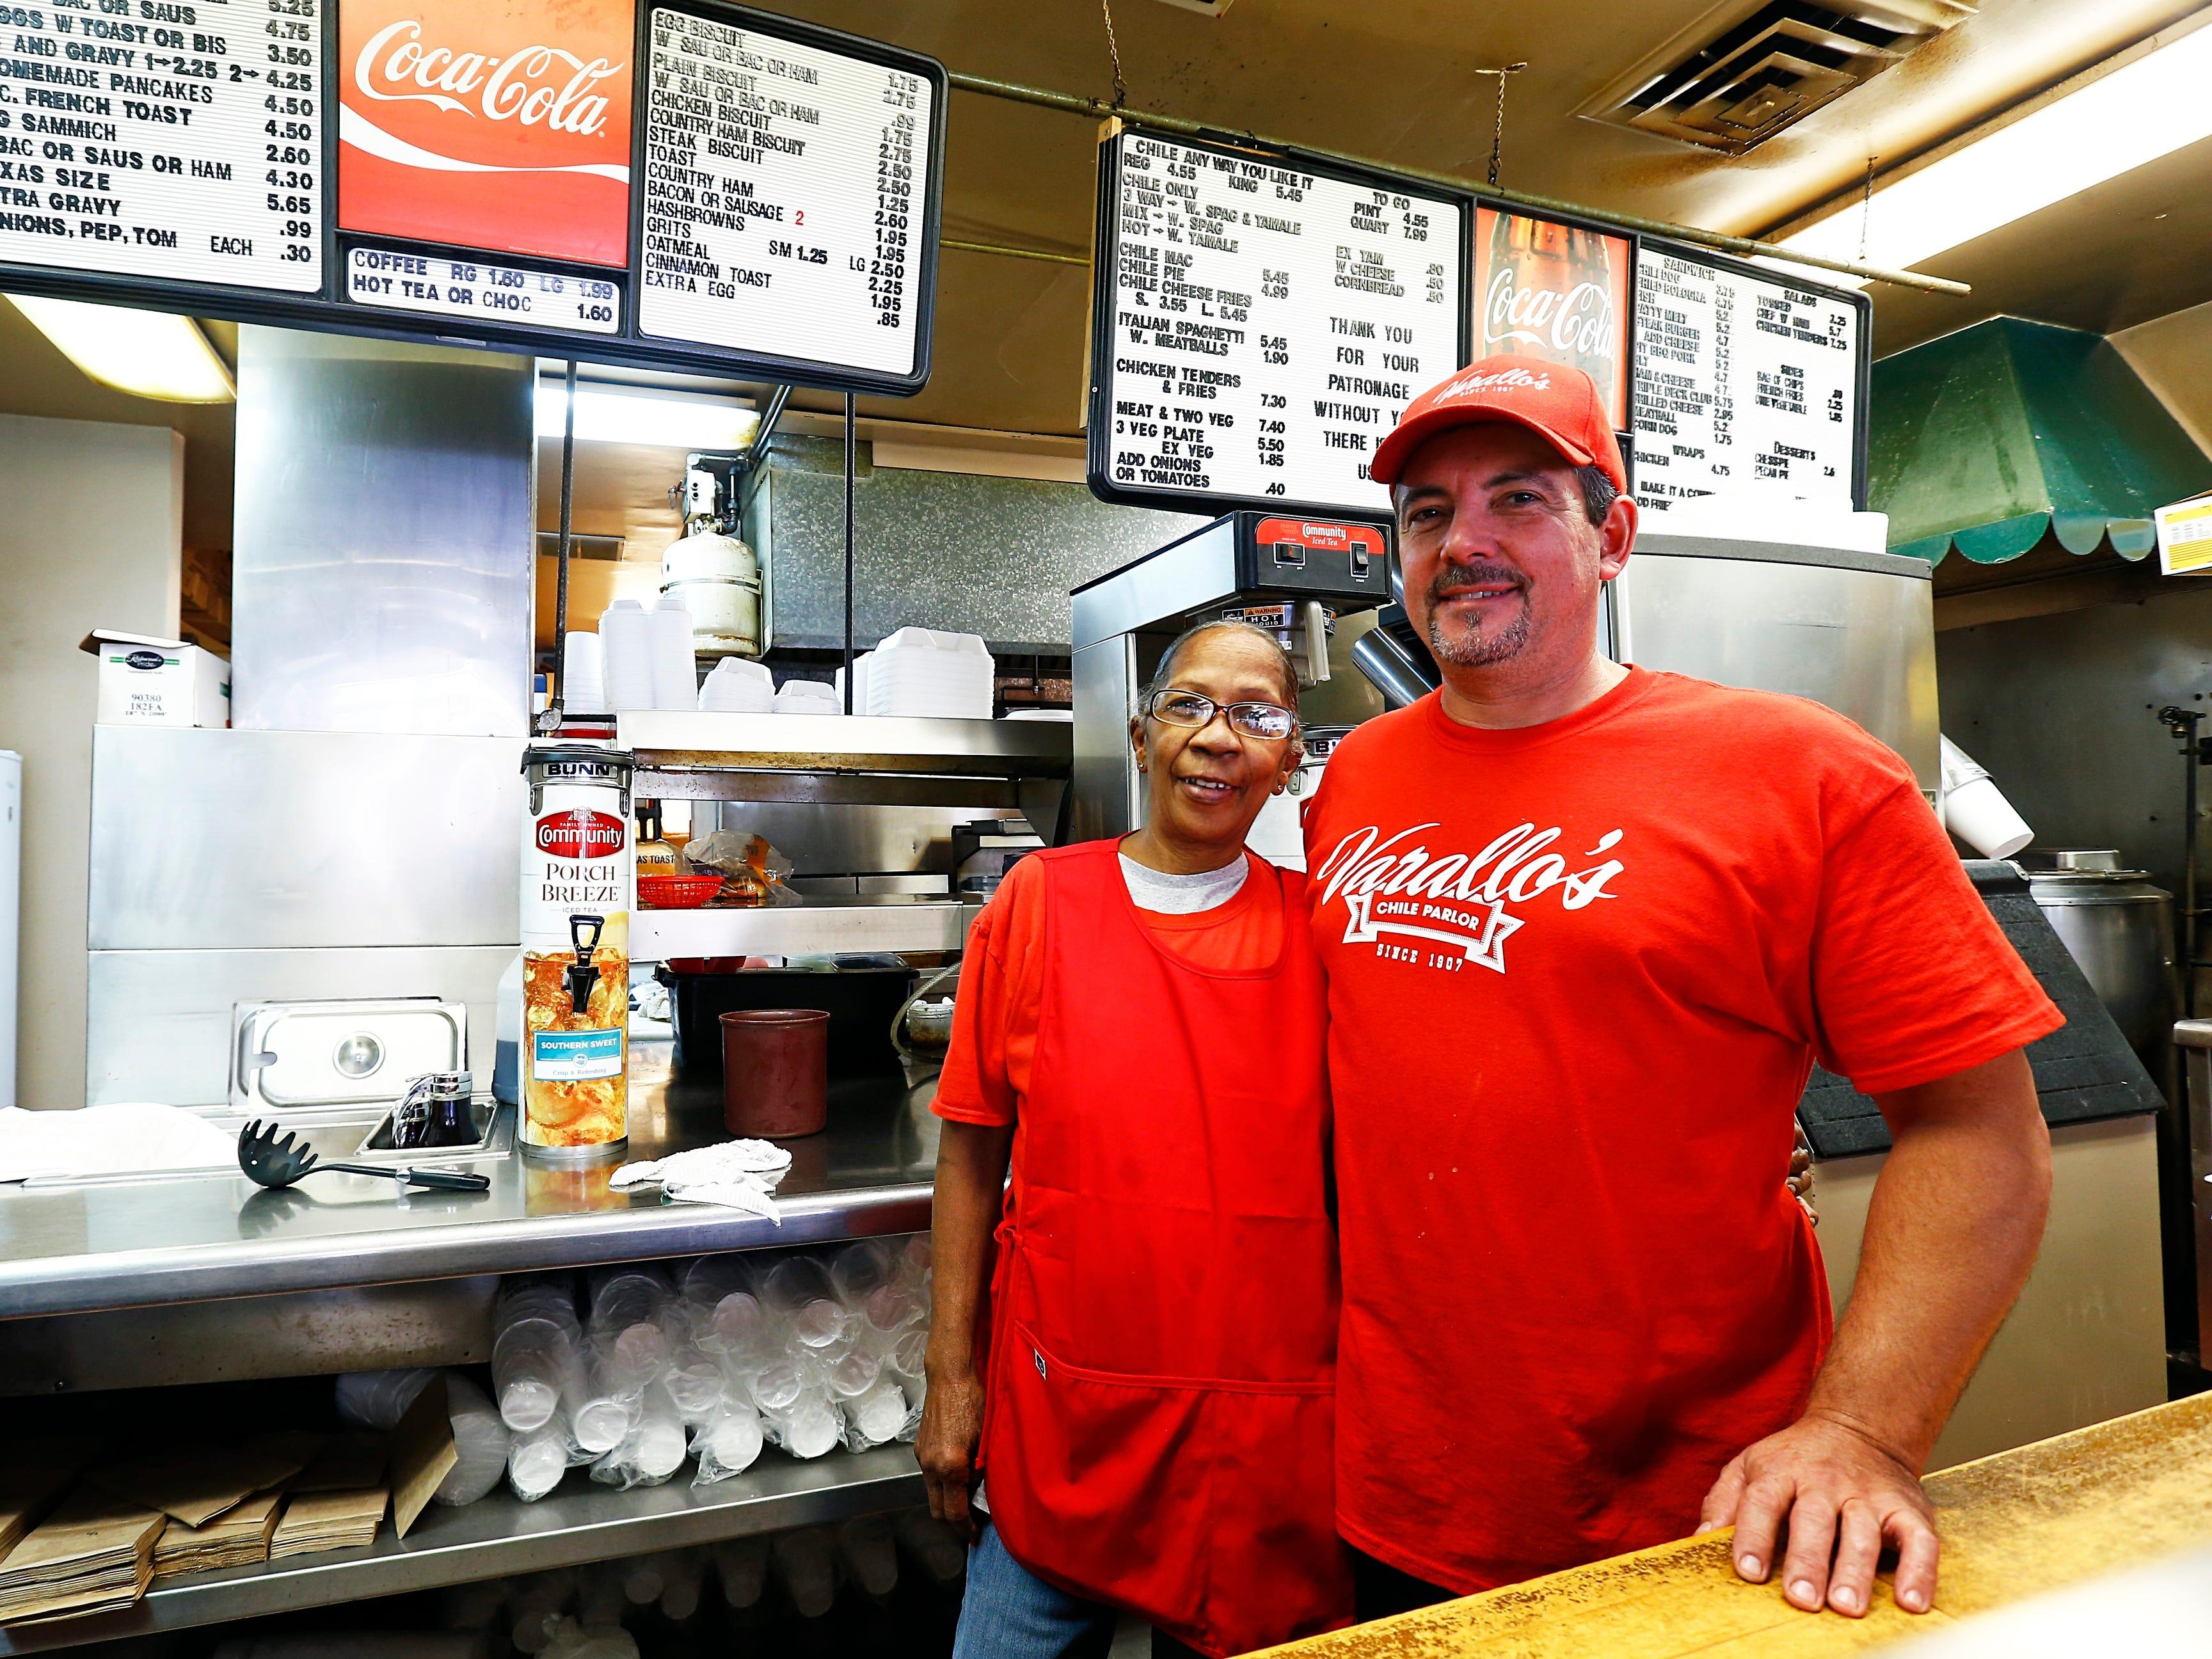 Todd Varallo, owner of Varallo's Chile Parlor & Restaurant, right, is seen with server Cheryl McKnight Monday, Oct. 29, 2018, in Nashville, Tenn.